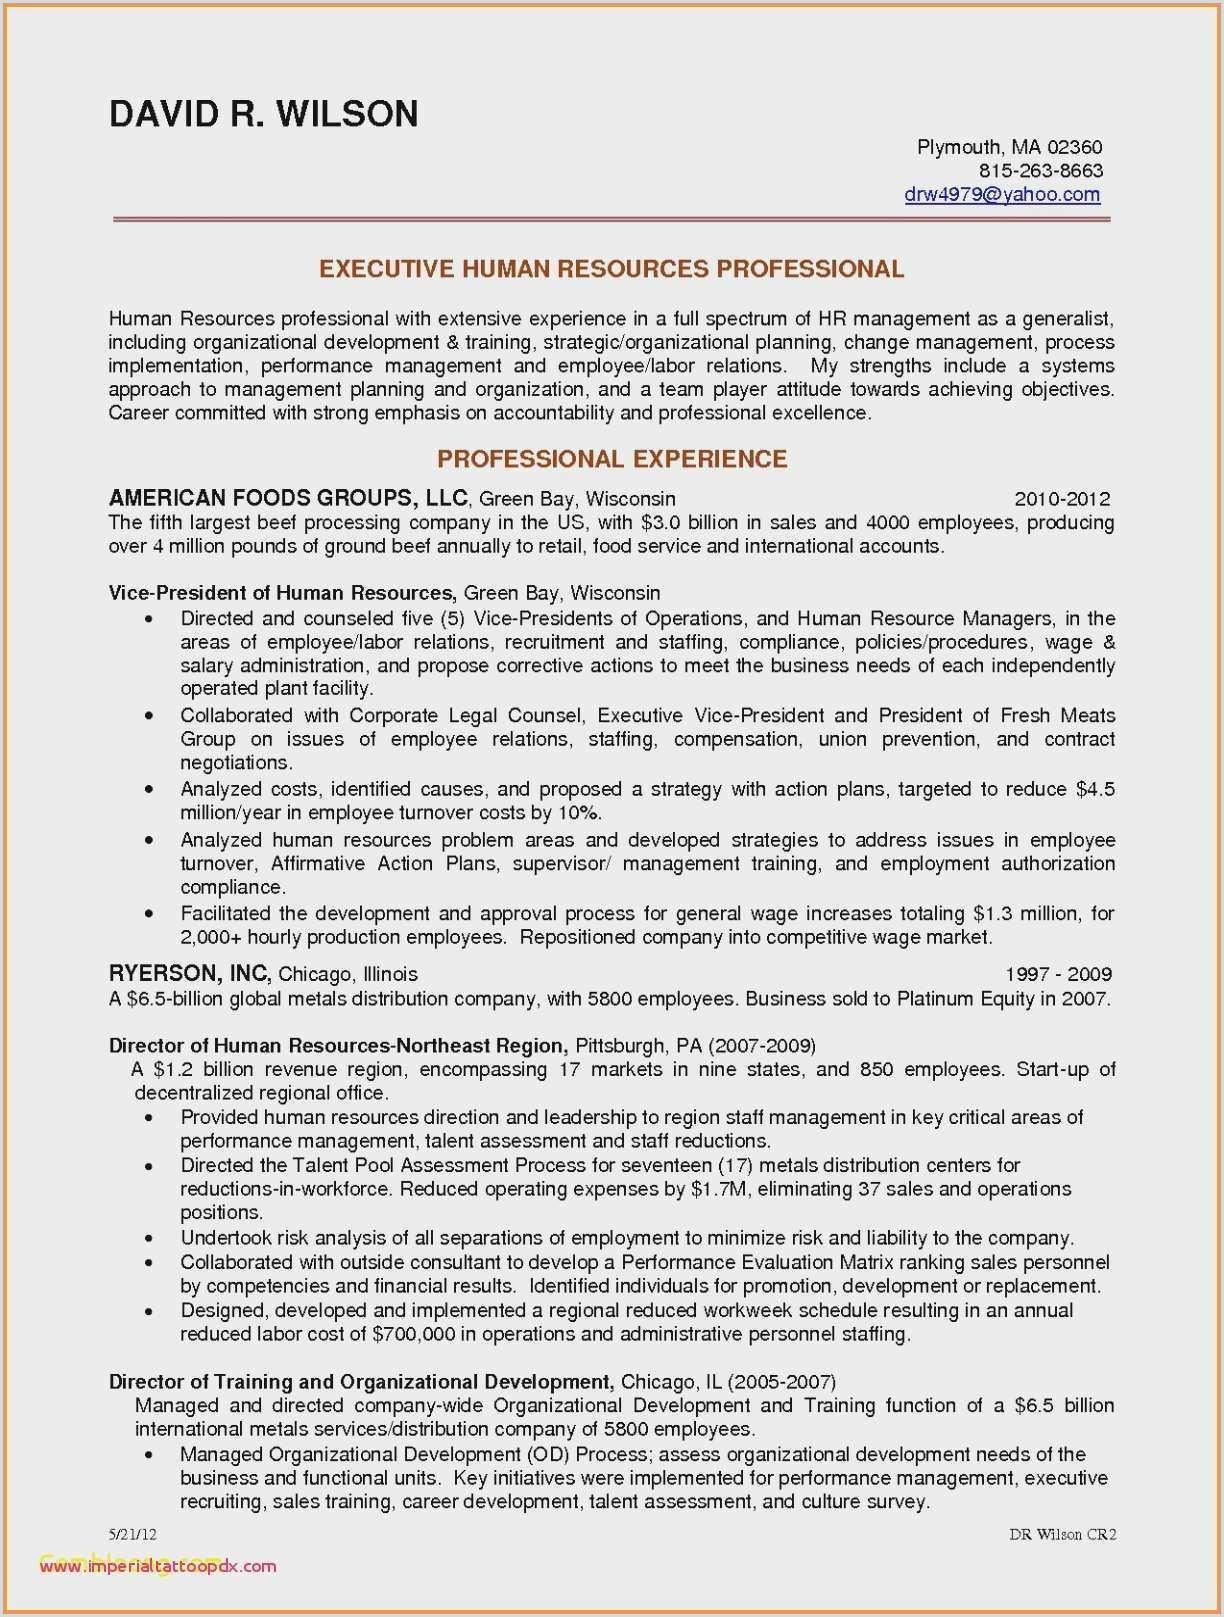 Professional Accountant Cv format Download Cv original Design Libre 14 Graphic Design Resume Personal